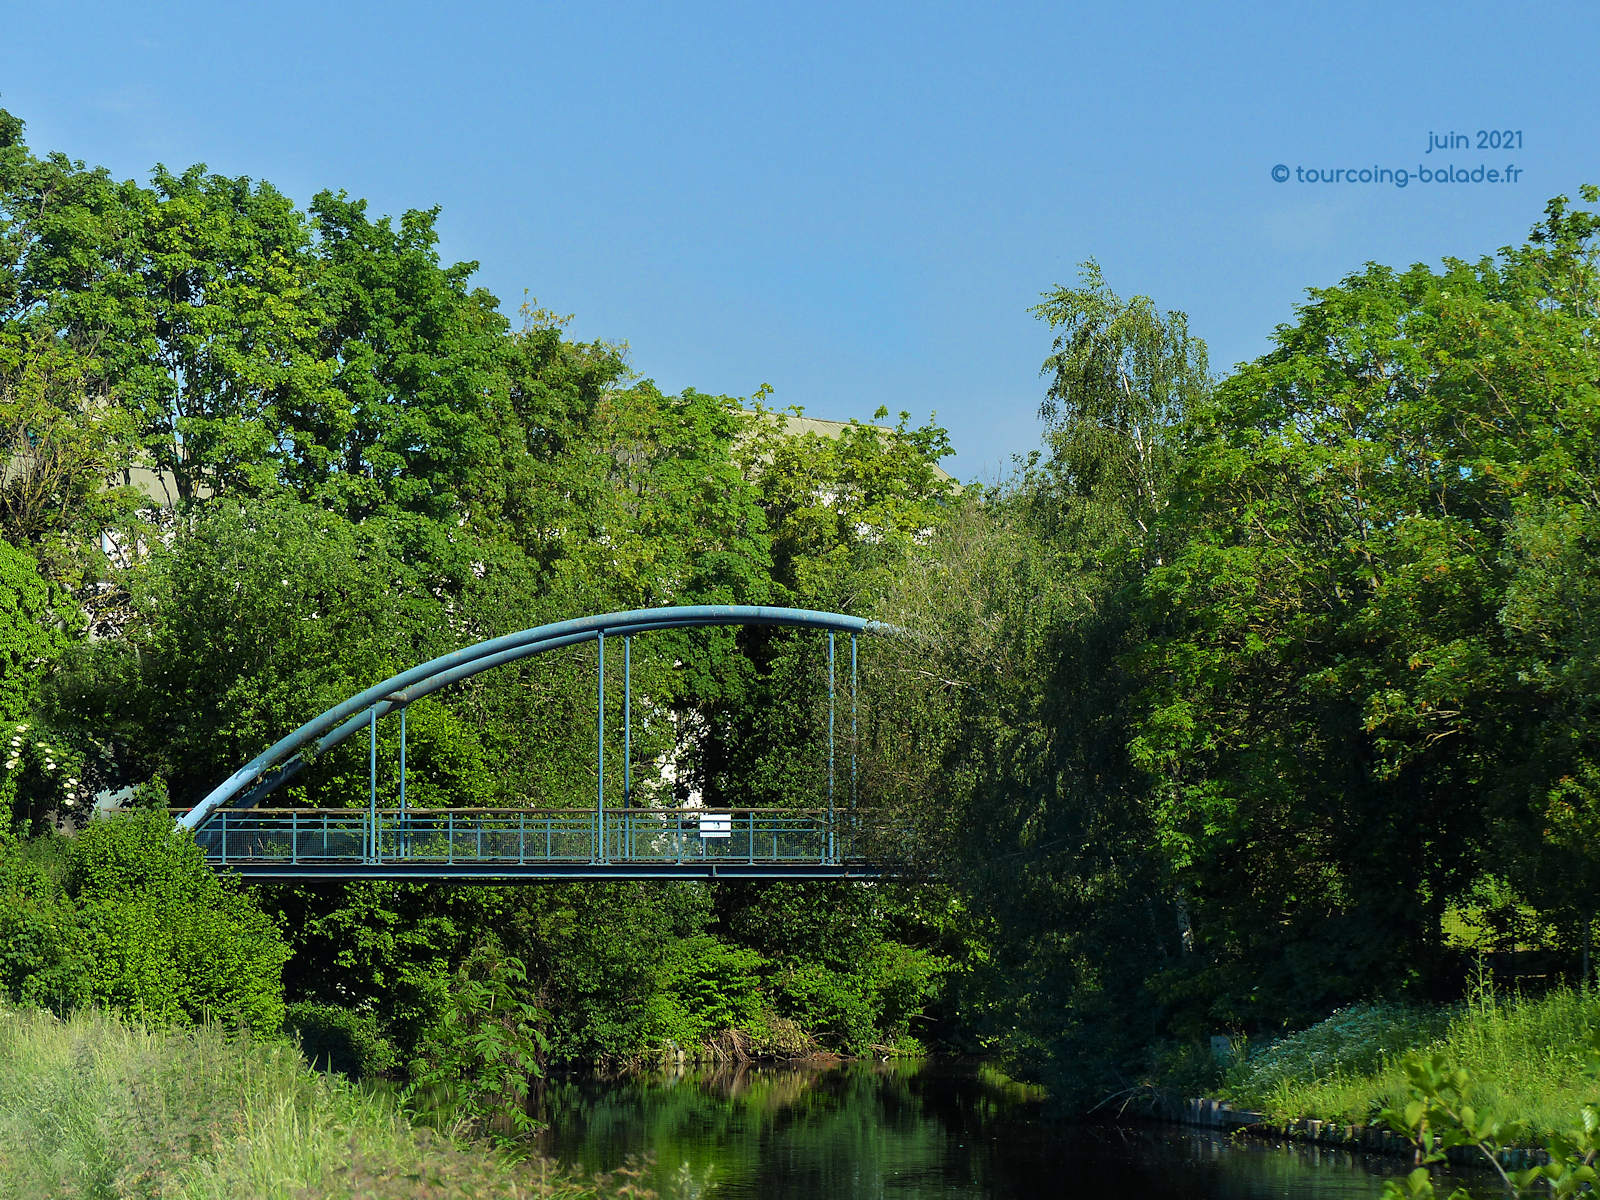 Marque canalisée, pont monpalsir, Marcq-en-Baroeul